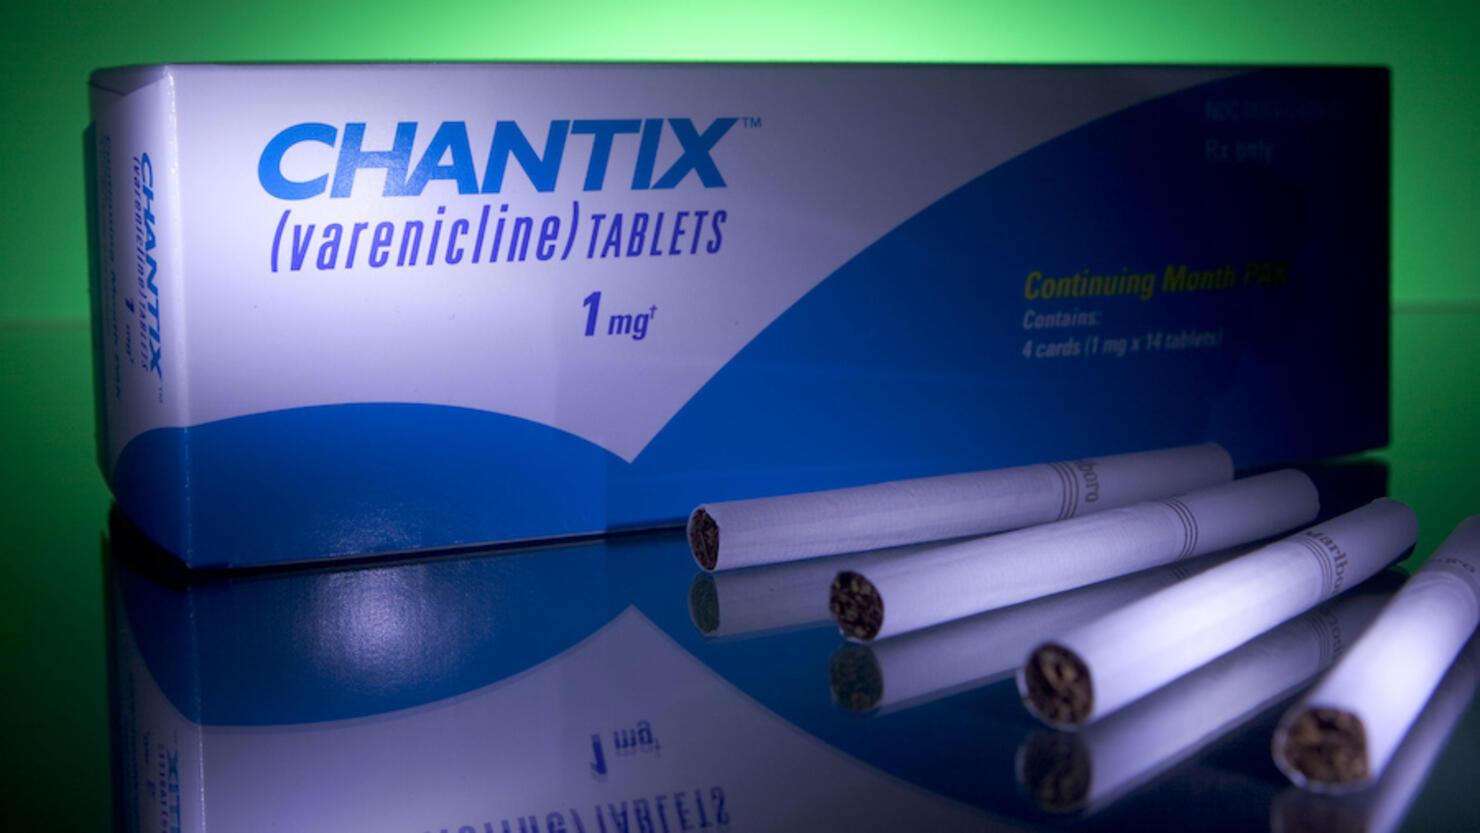 Smoking cessation drug Chantix is arranged at Skenderian Apo